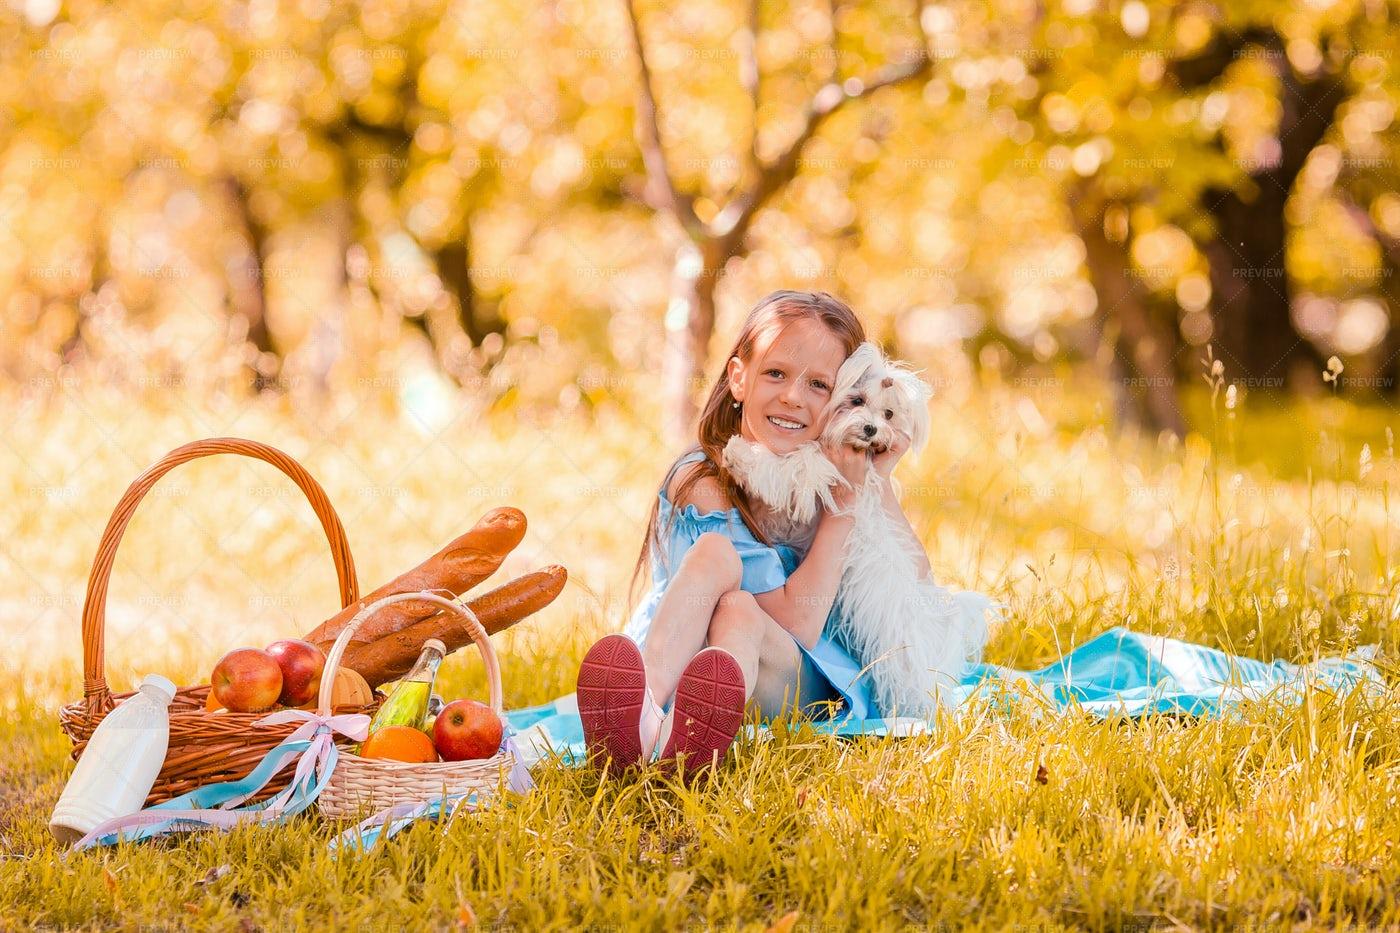 Picnic And A Dog: Stock Photos